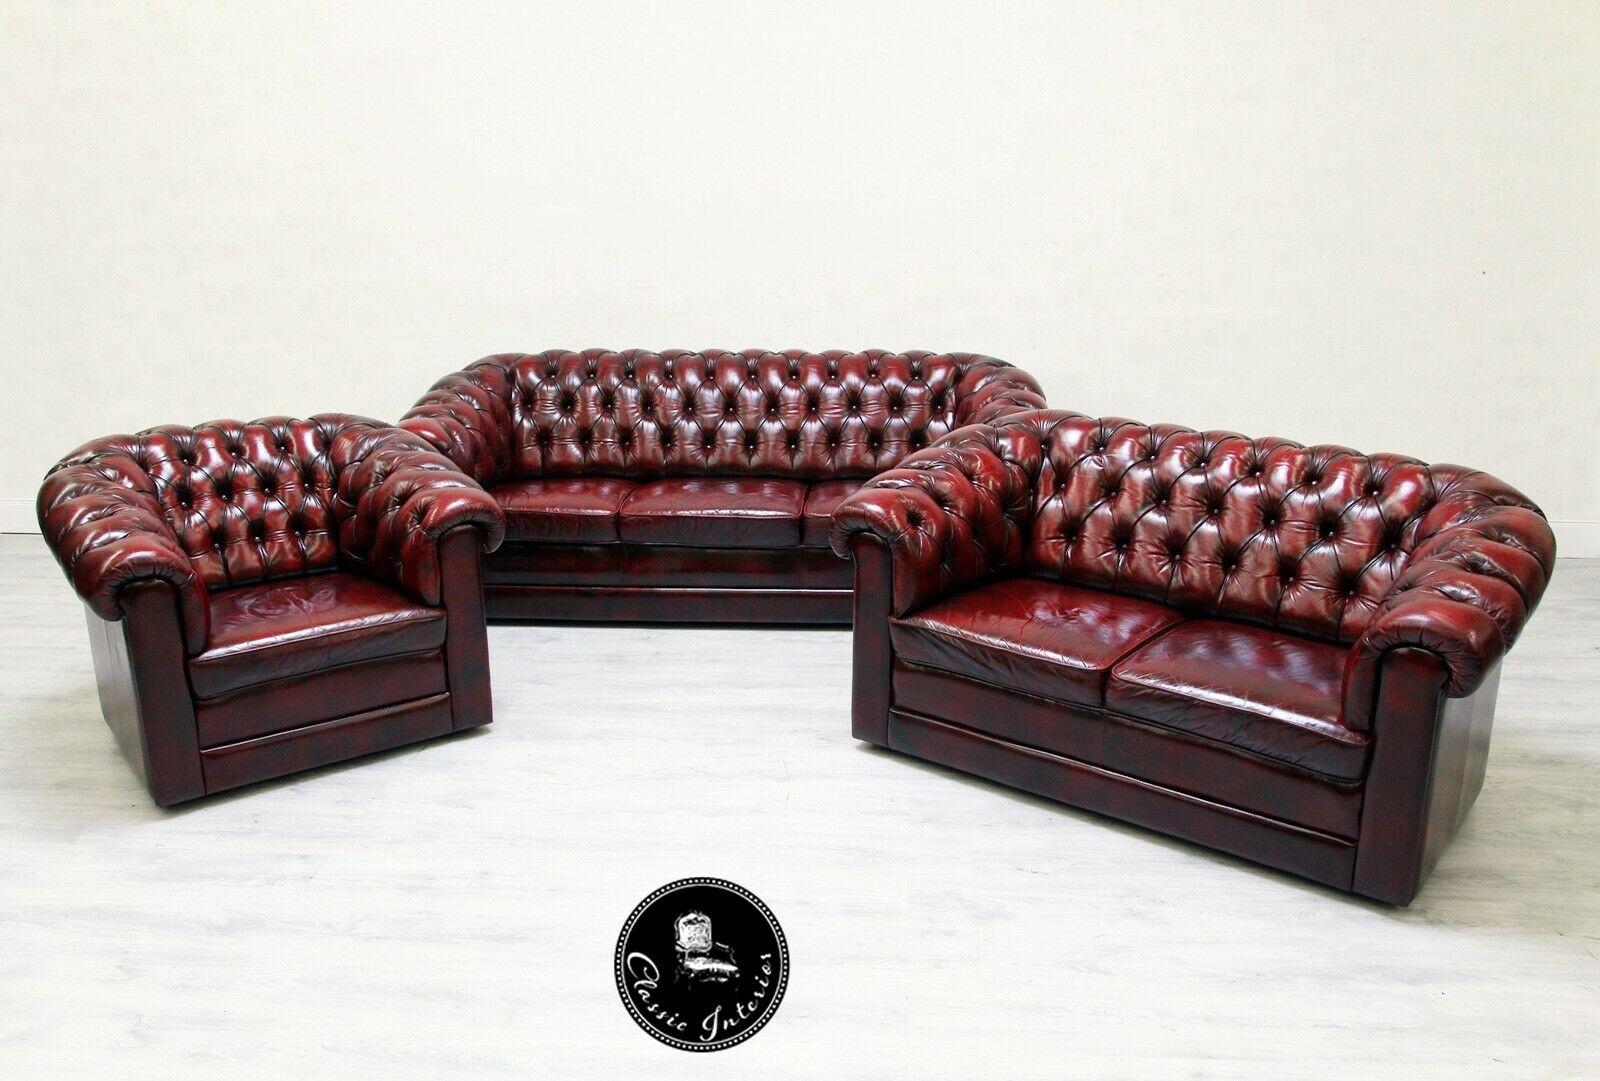 Full Size of Chesterfield Sofa Garnitur Sessel Echtleder Couch Antik Oxblood Reiniger Schlaffunktion Led Inhofer Halbrundes Bunt Türkische Bezug Ecksofa 3er Canape Barock Sofa Sofa Antik